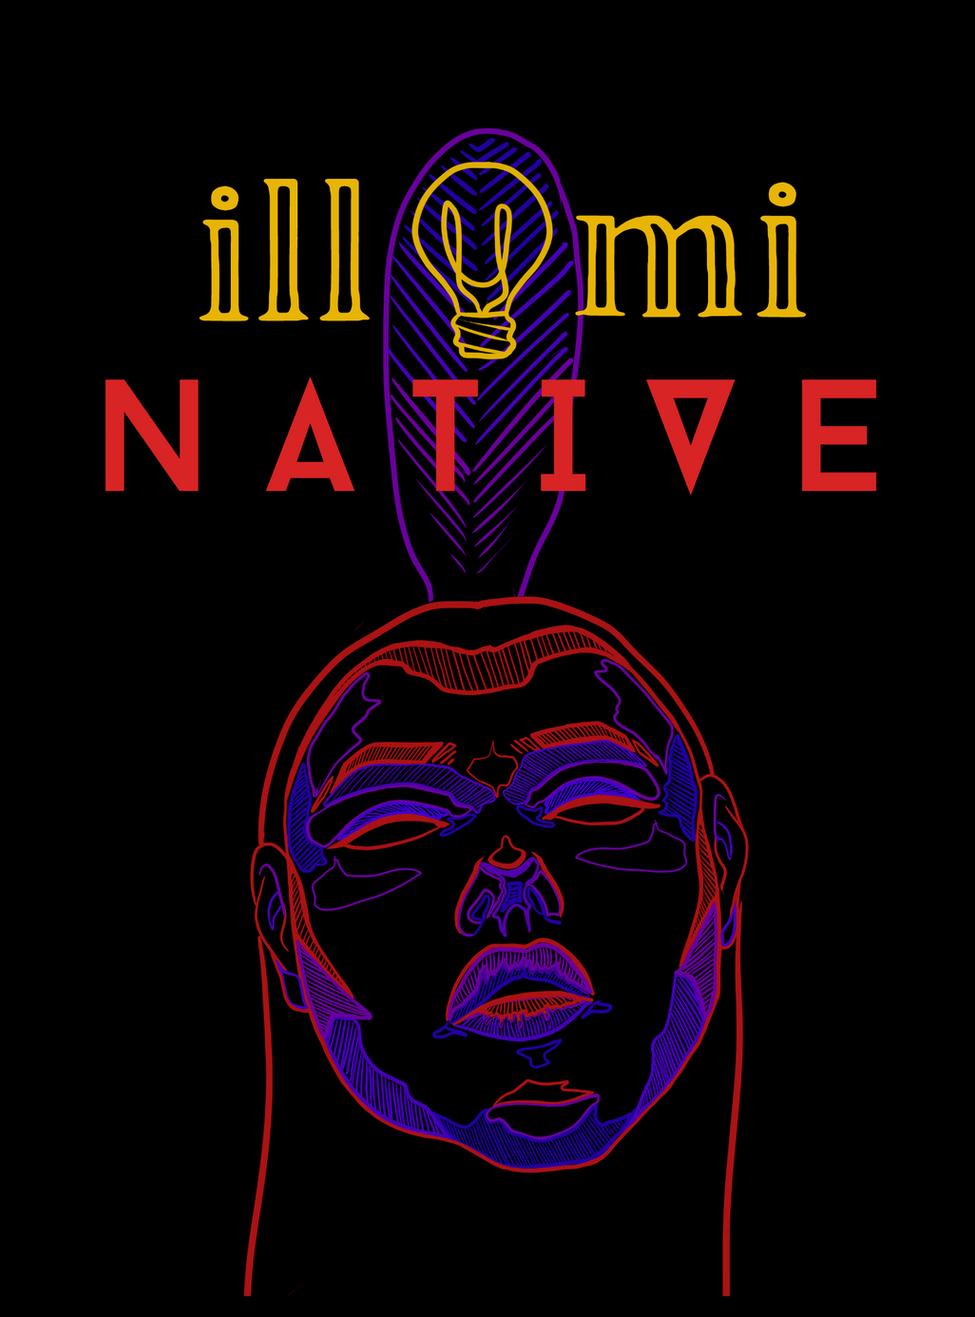 [Original size] NATIVE (1).png